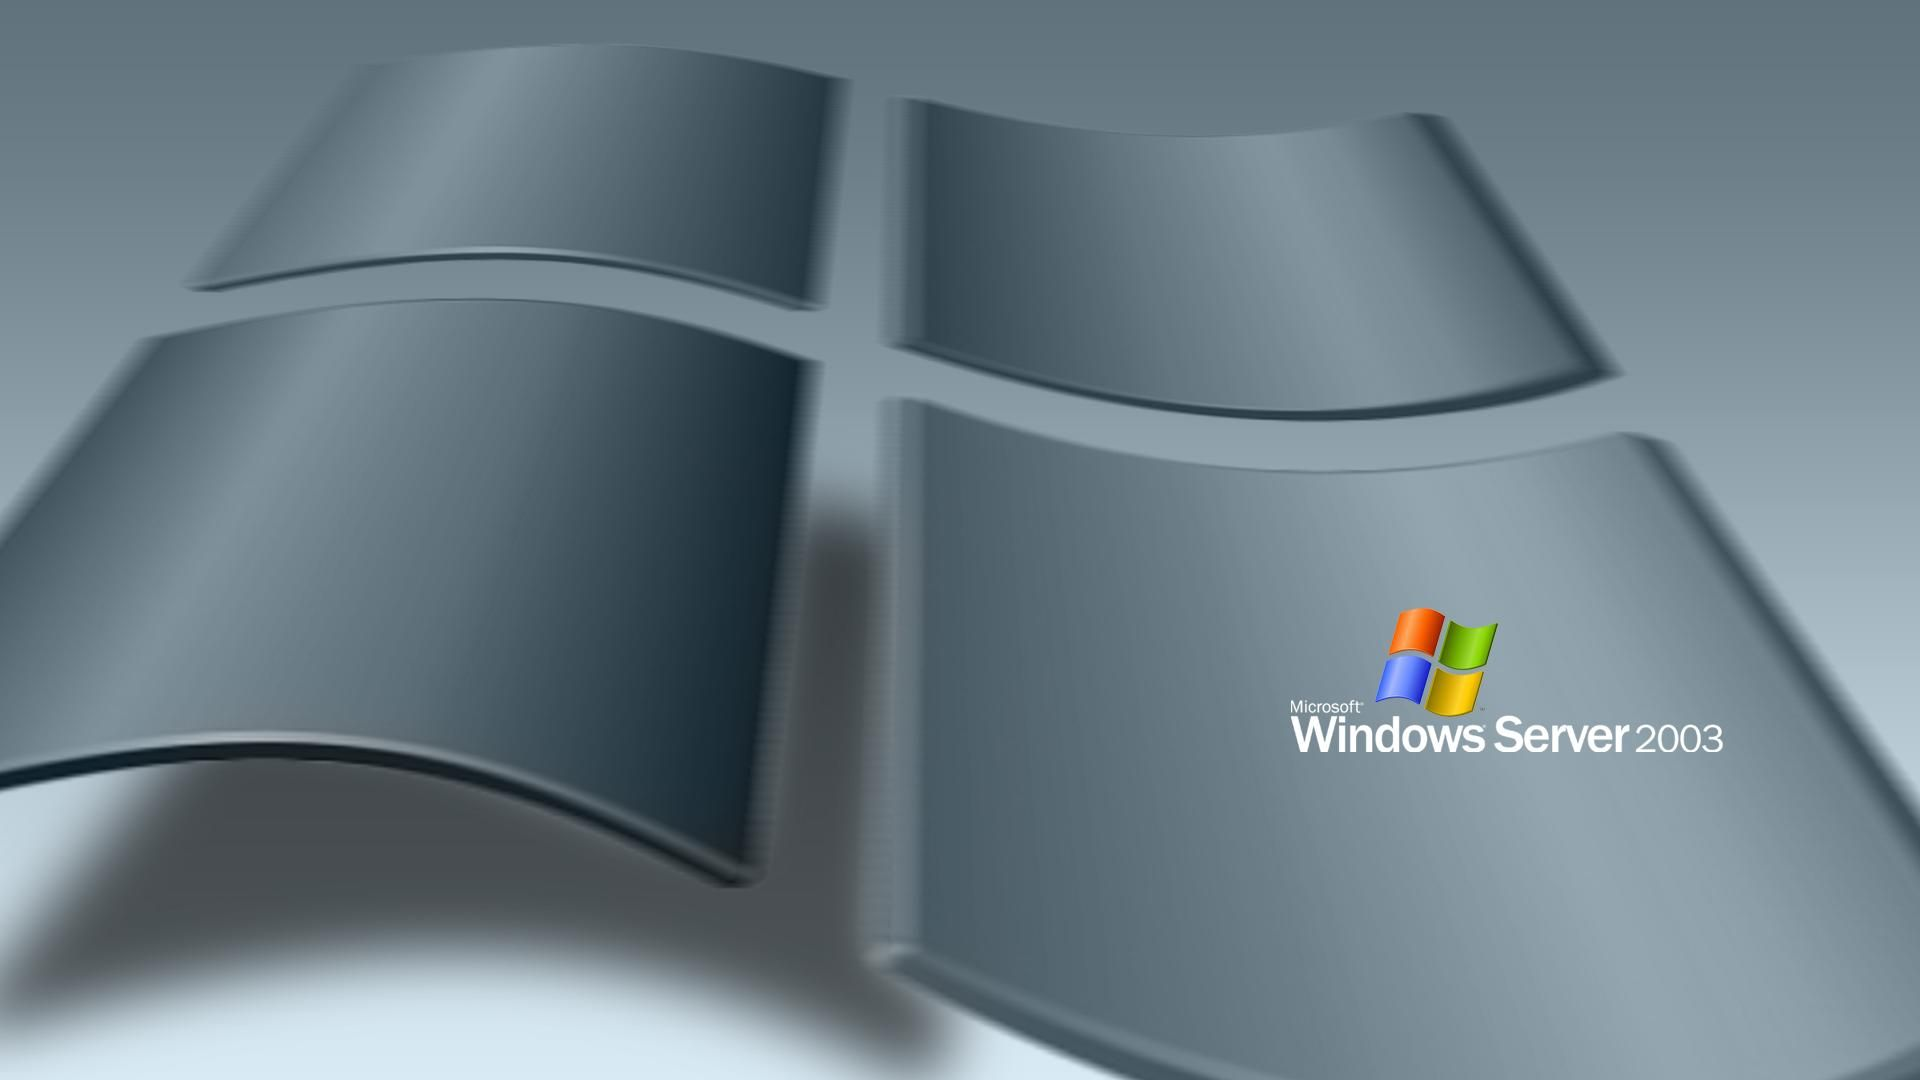 Windows Server Wallpapers Wallpaper 1920 1080 Windows Server Wallpapers 31 Wallpapers Adorable Wallpapers Windows Server Windows Xp Windows